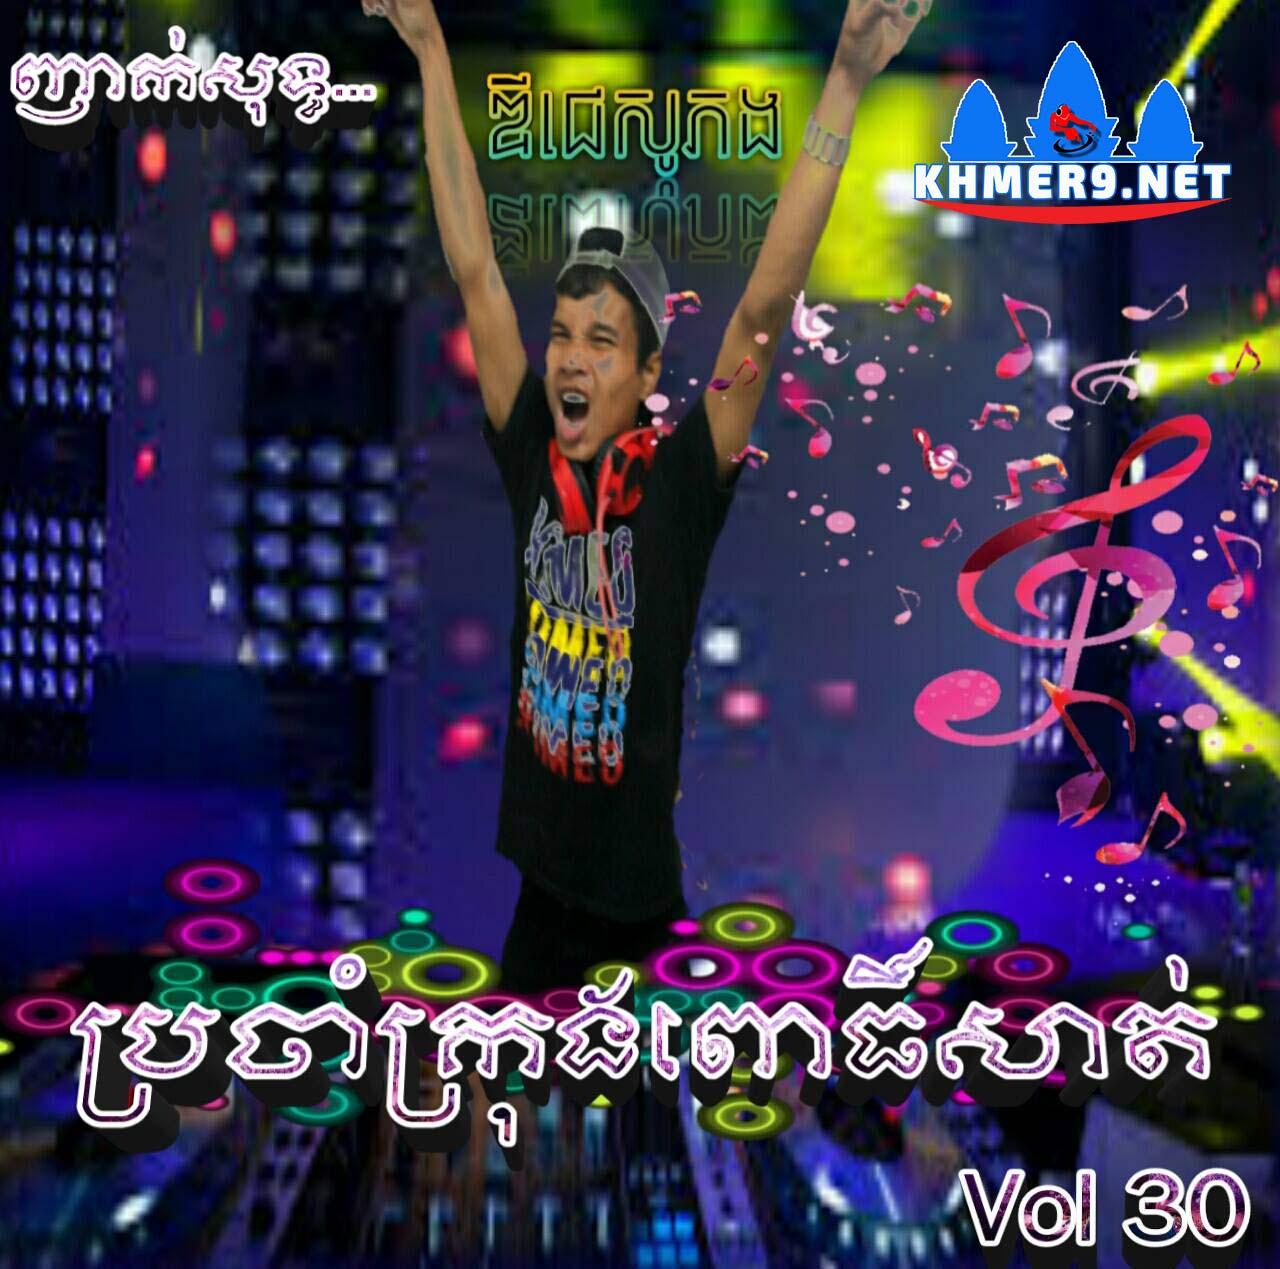 New Mashup Romantic Song Download: Dj So Porg Remix Vol 30